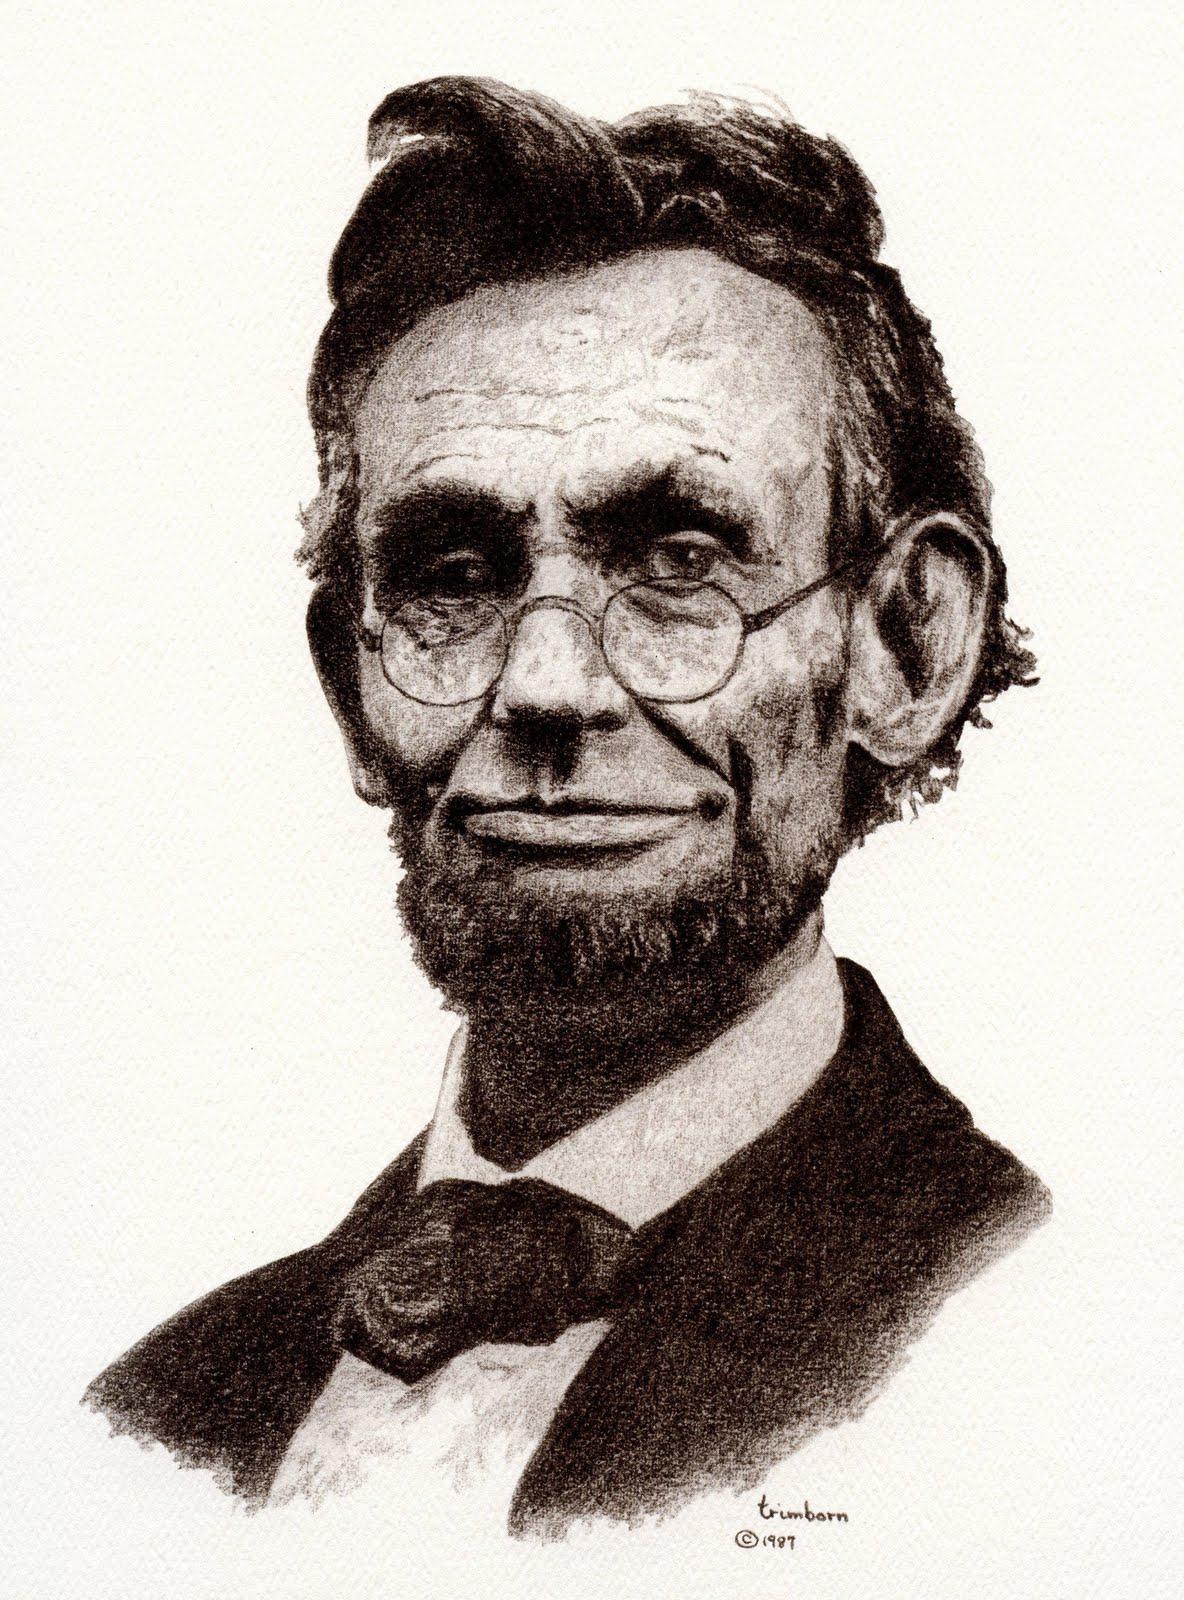 1184x1600 How To Draw Abraham Lincoln Face Lobojo's Den The Non Bilateral